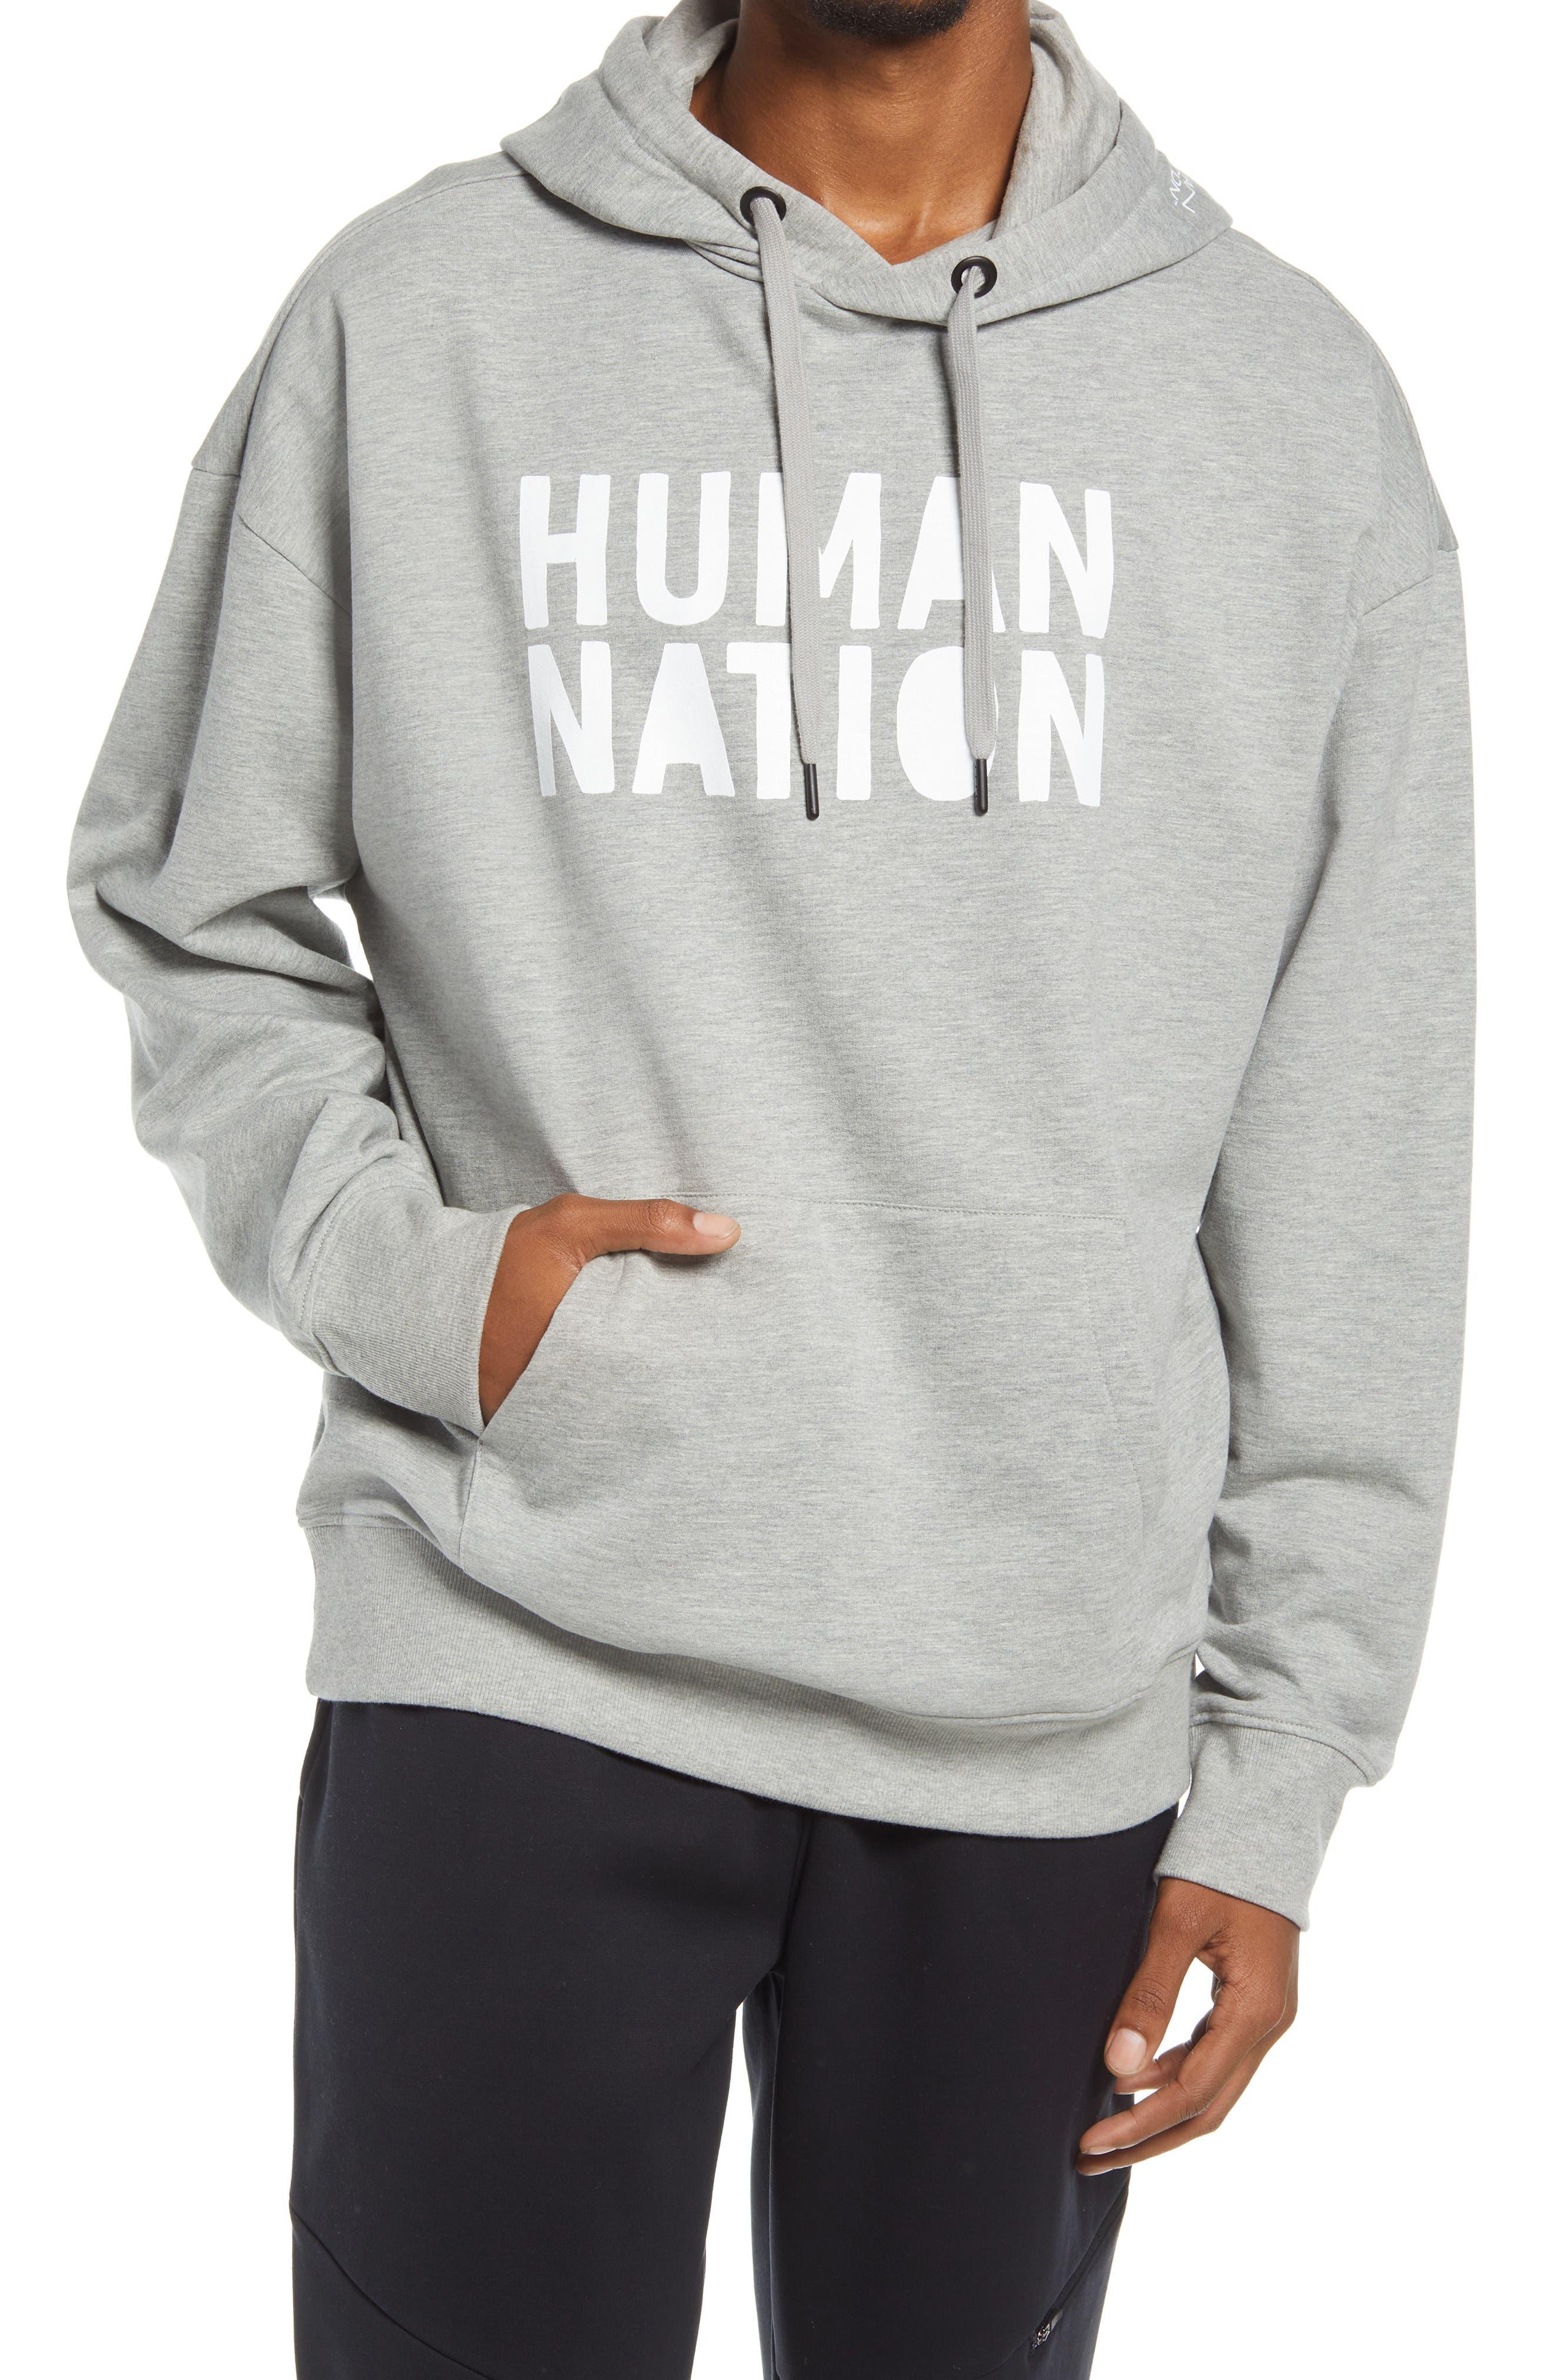 HUMAN NATION Gender Inclusive Organic Cotton Blend Logo Hoodie